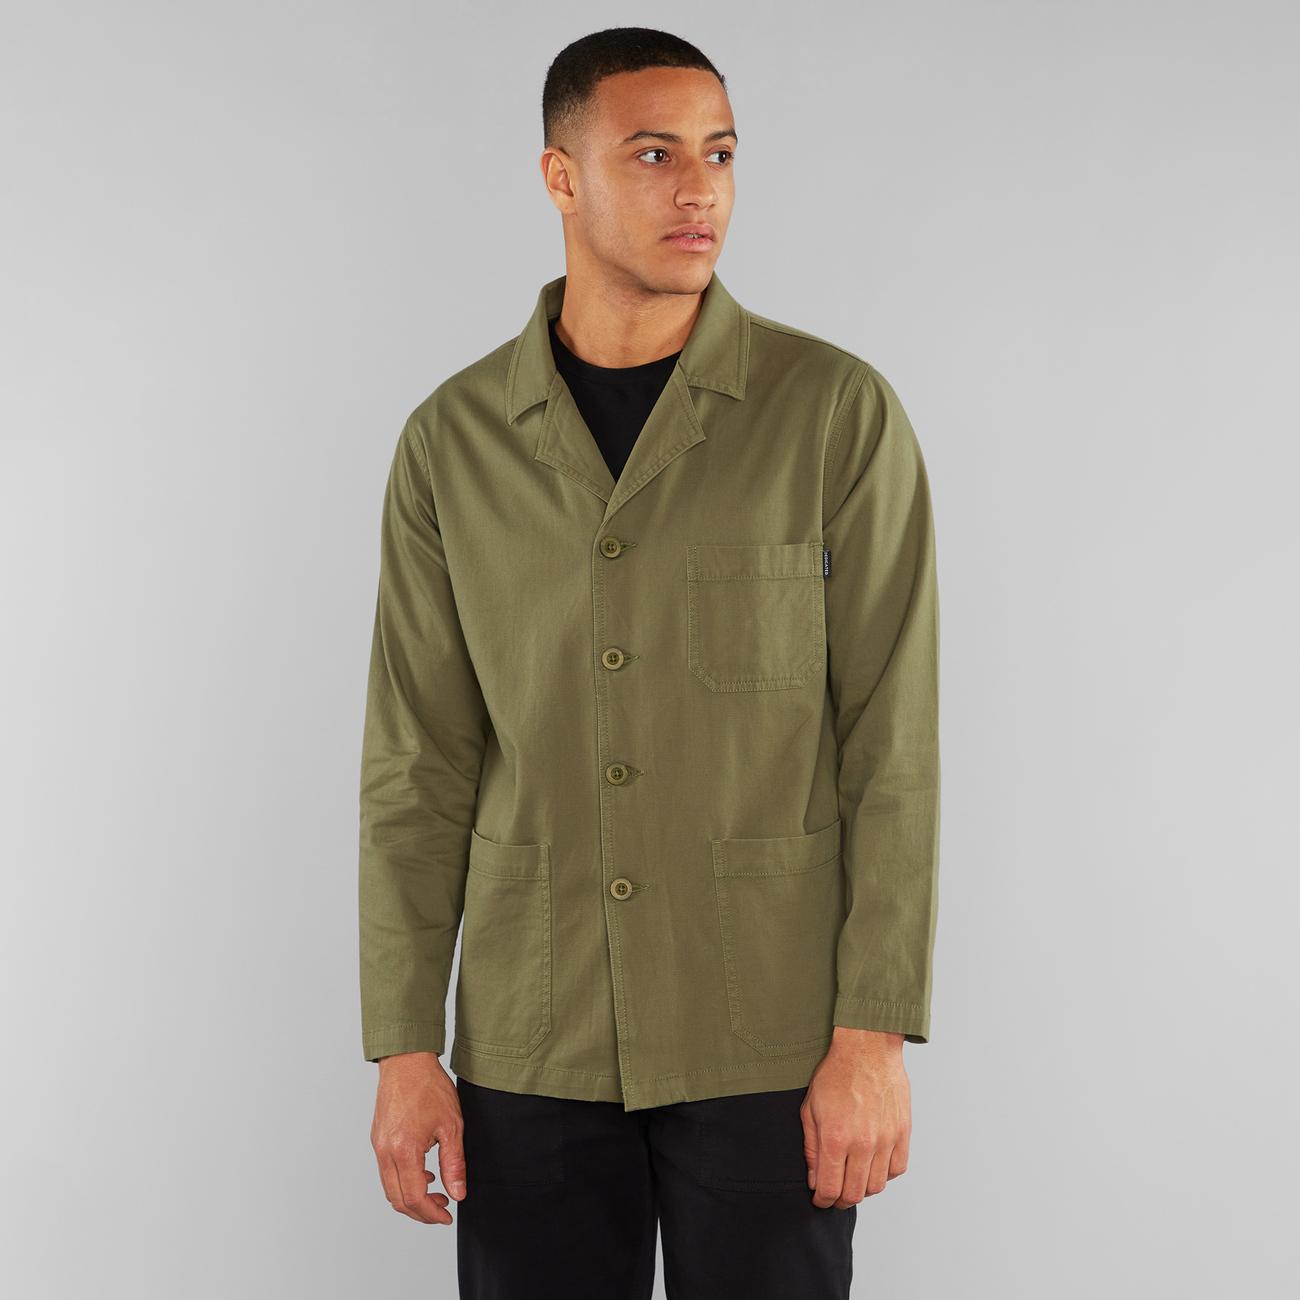 Jacket Leksand Olive Green